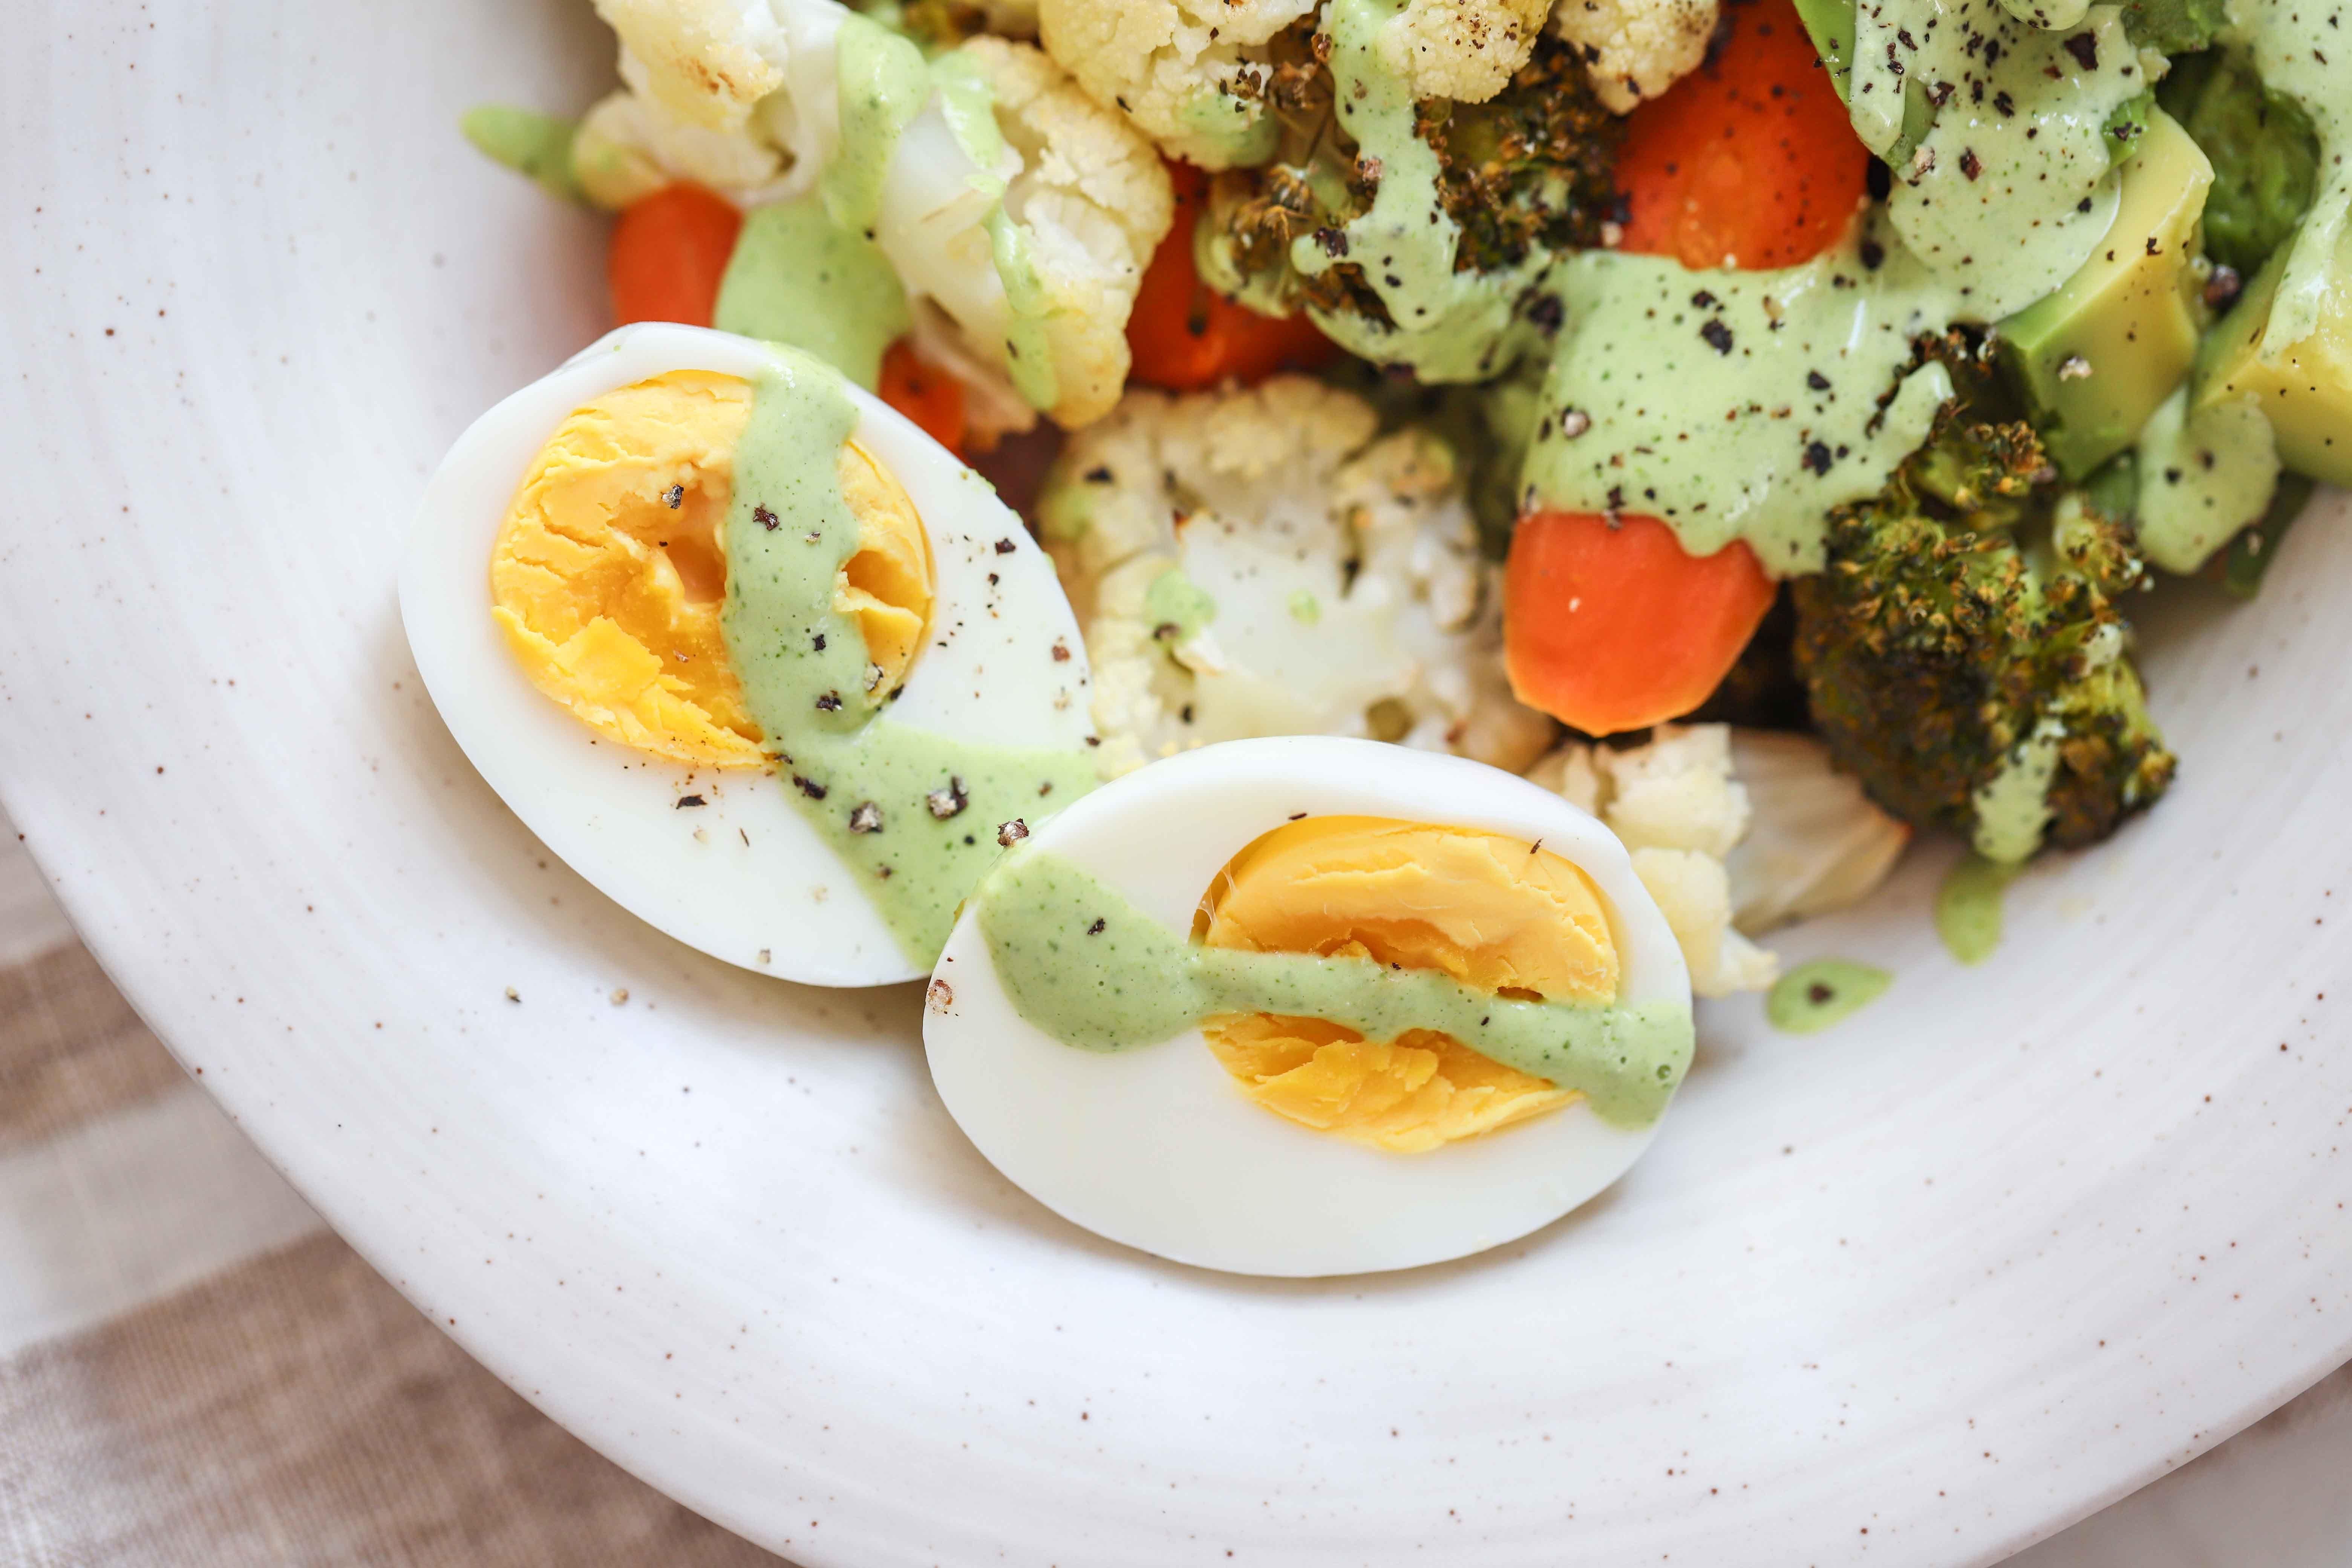 Apa yang akan terjadi jika tidak amalkan pemakanan sihat